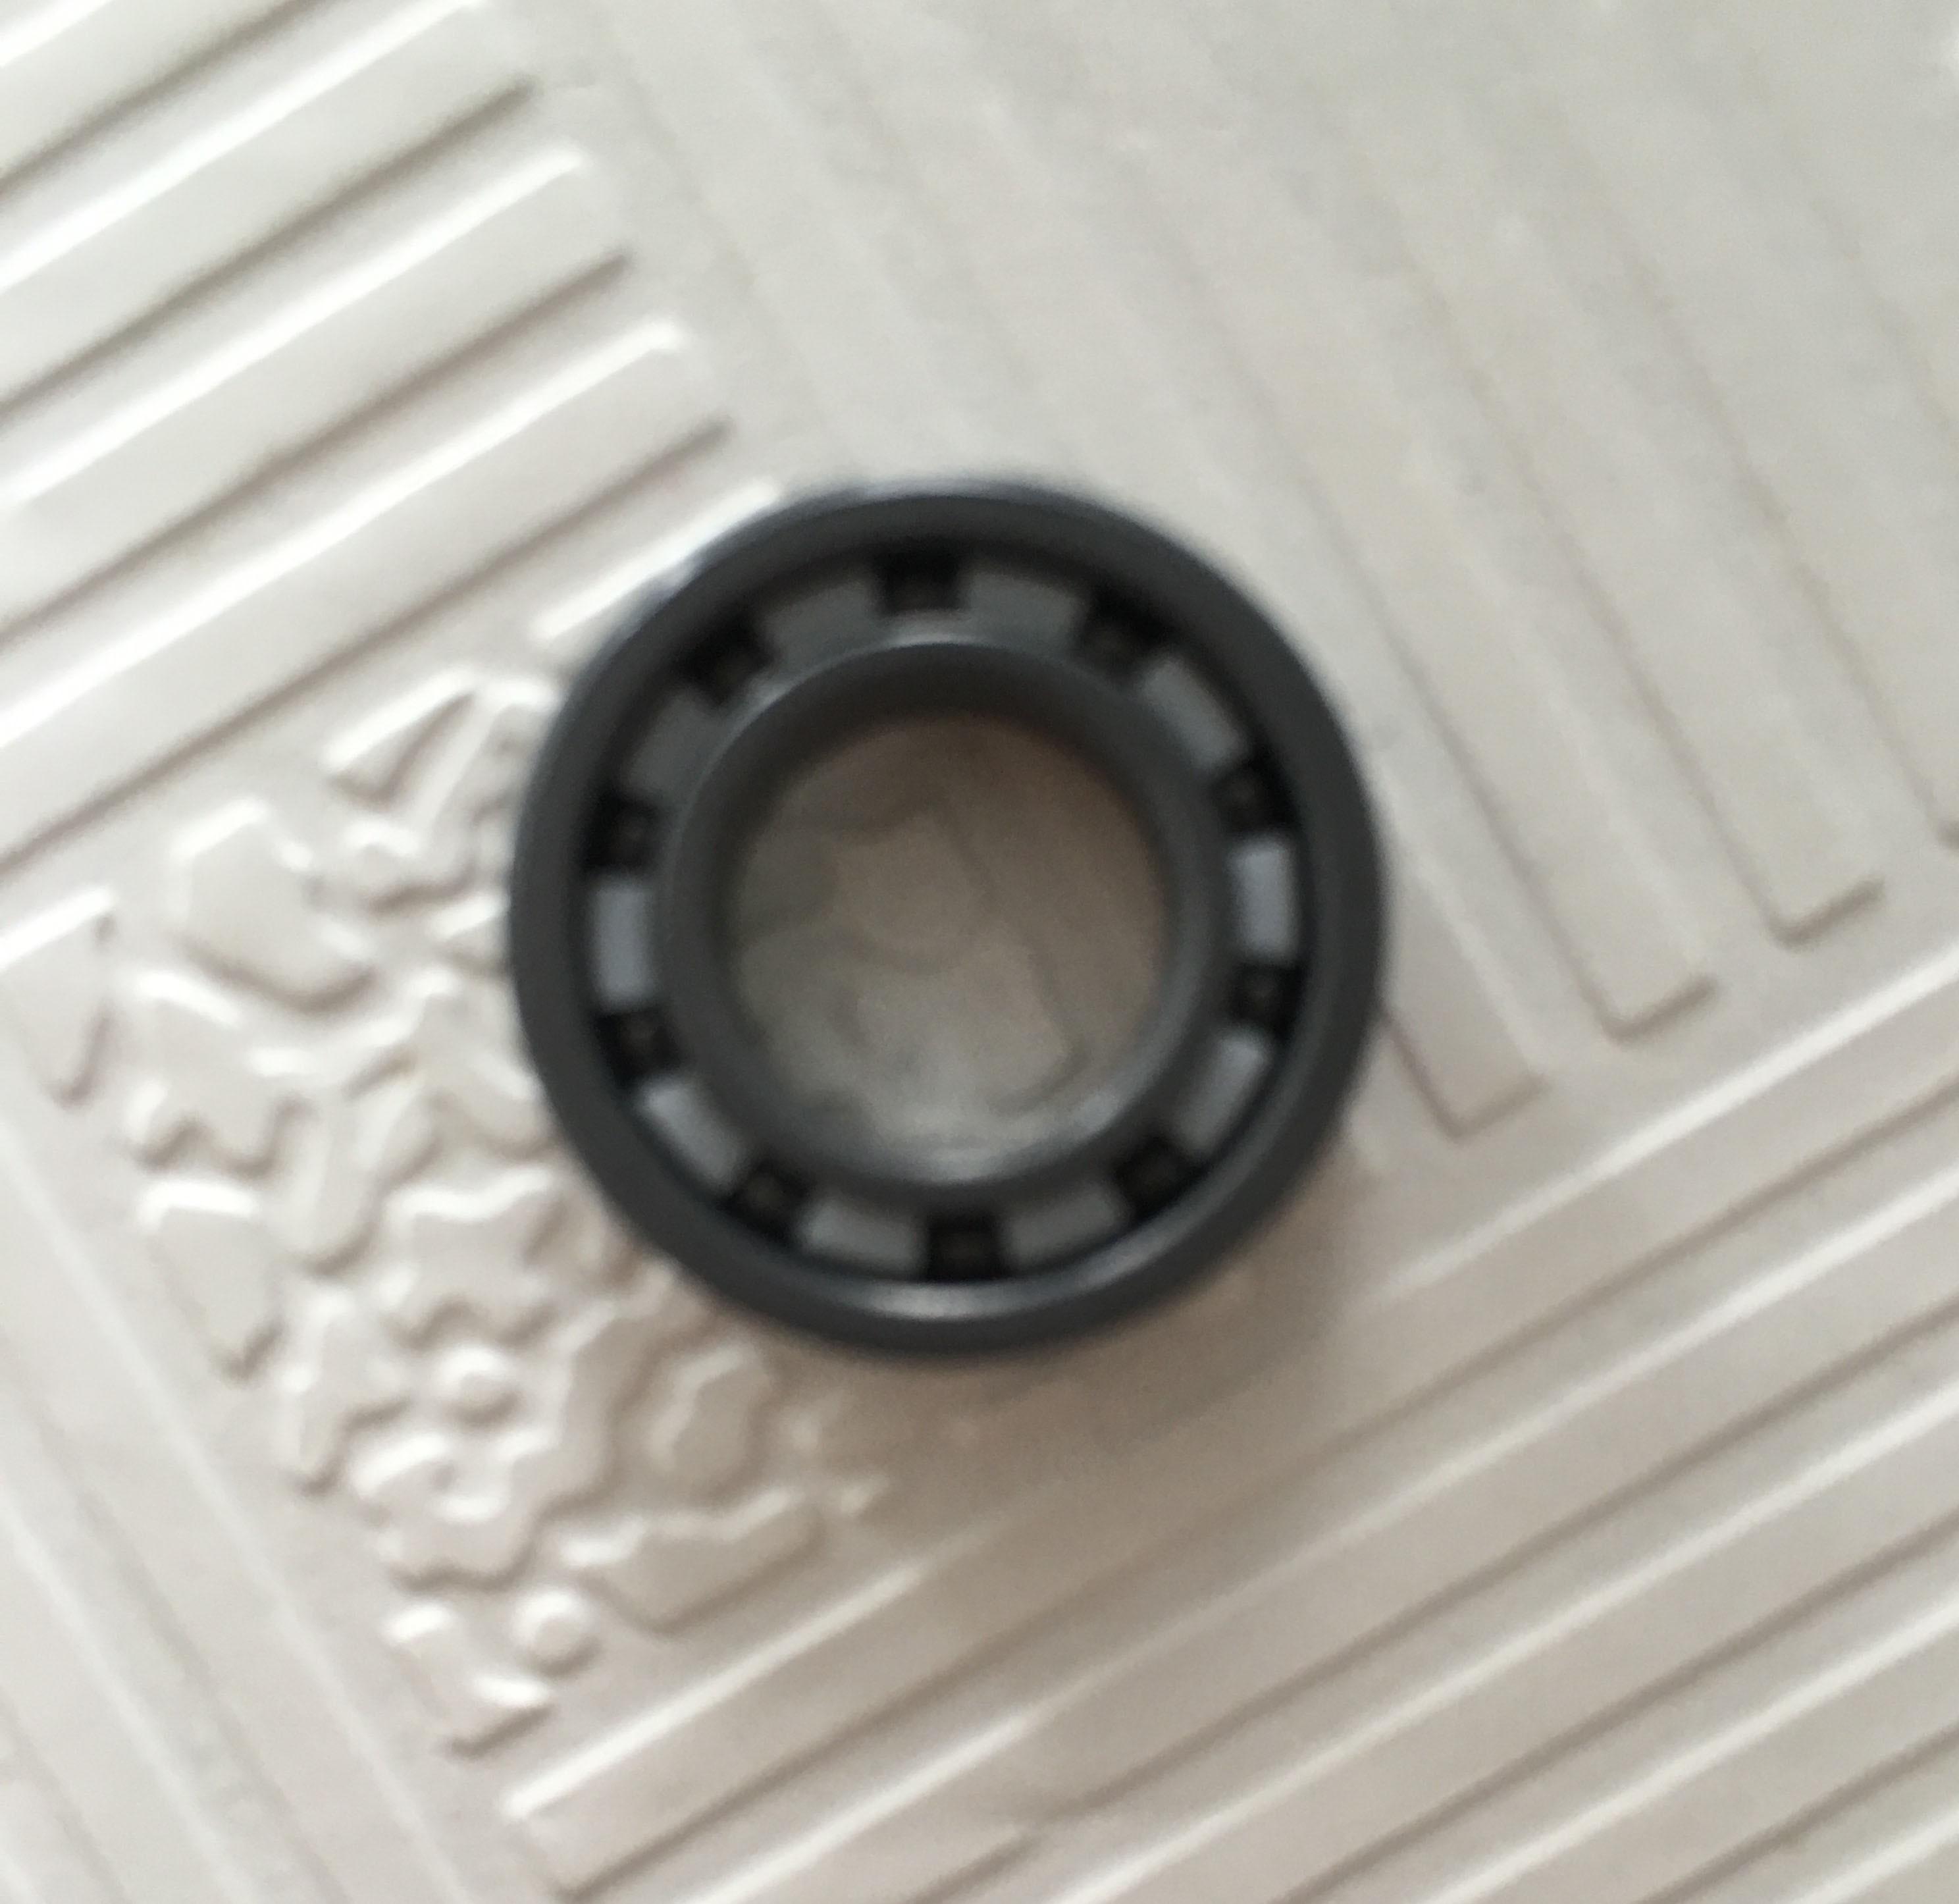 Free shipping 625 full SI3N4 ceramic deep groove ball bearing 5x16x5mm P0 ABEC1 gcr15 6326 zz or 6326 2rs 130x280x58mm high precision deep groove ball bearings abec 1 p0